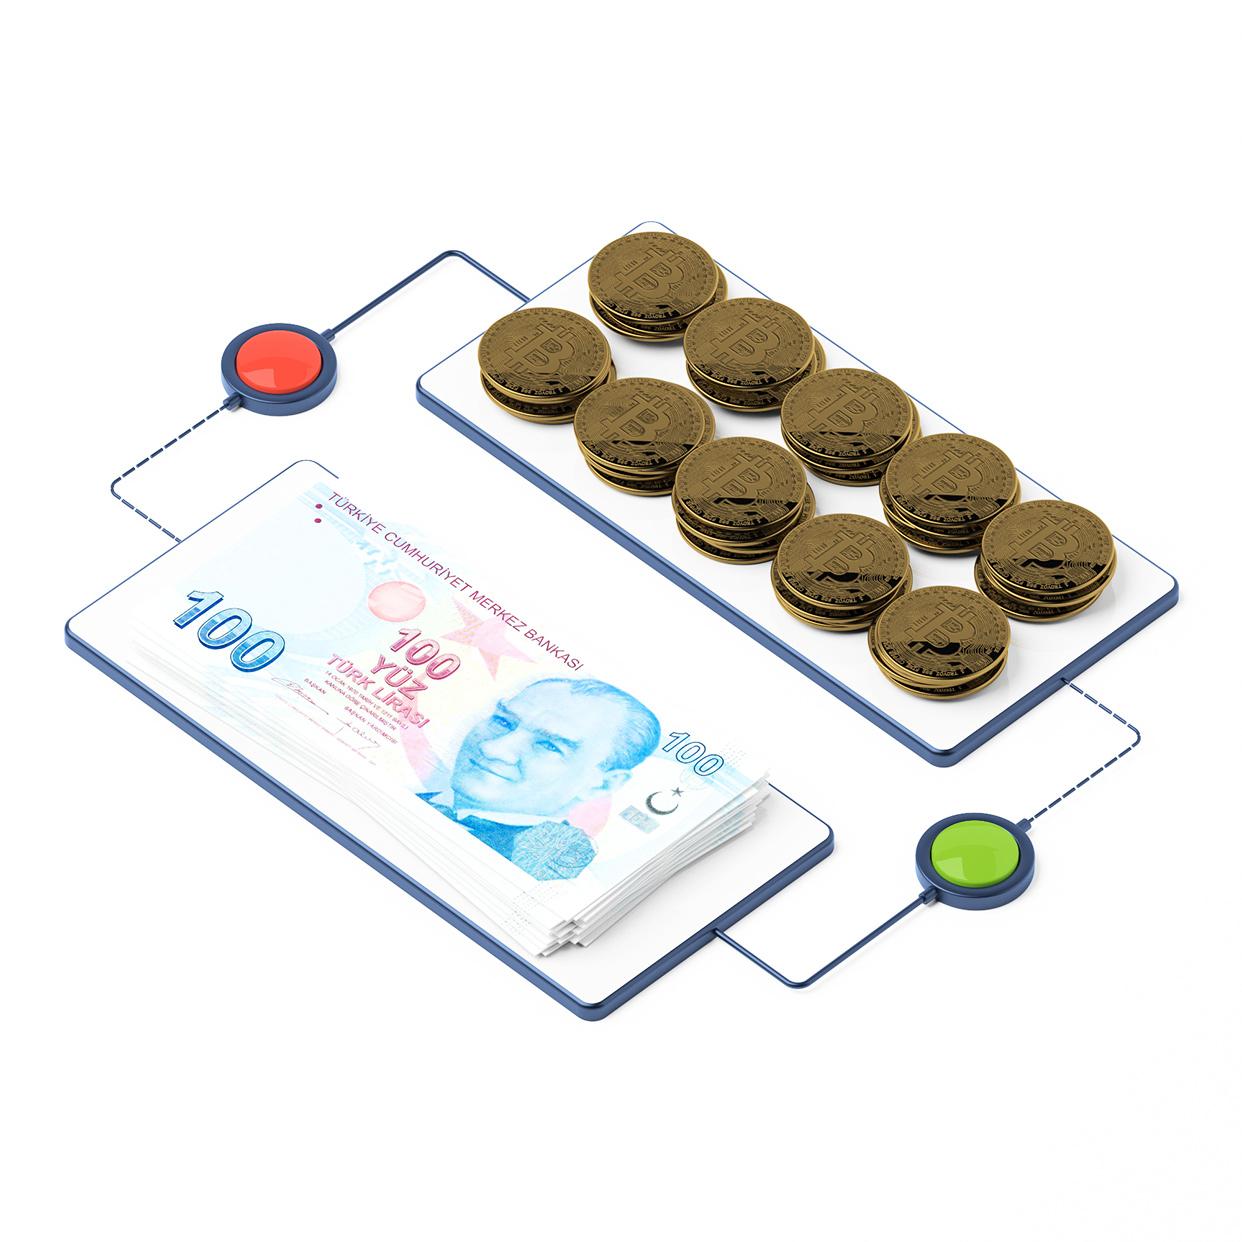 01-Buy-Sell-Bitcoin@3x